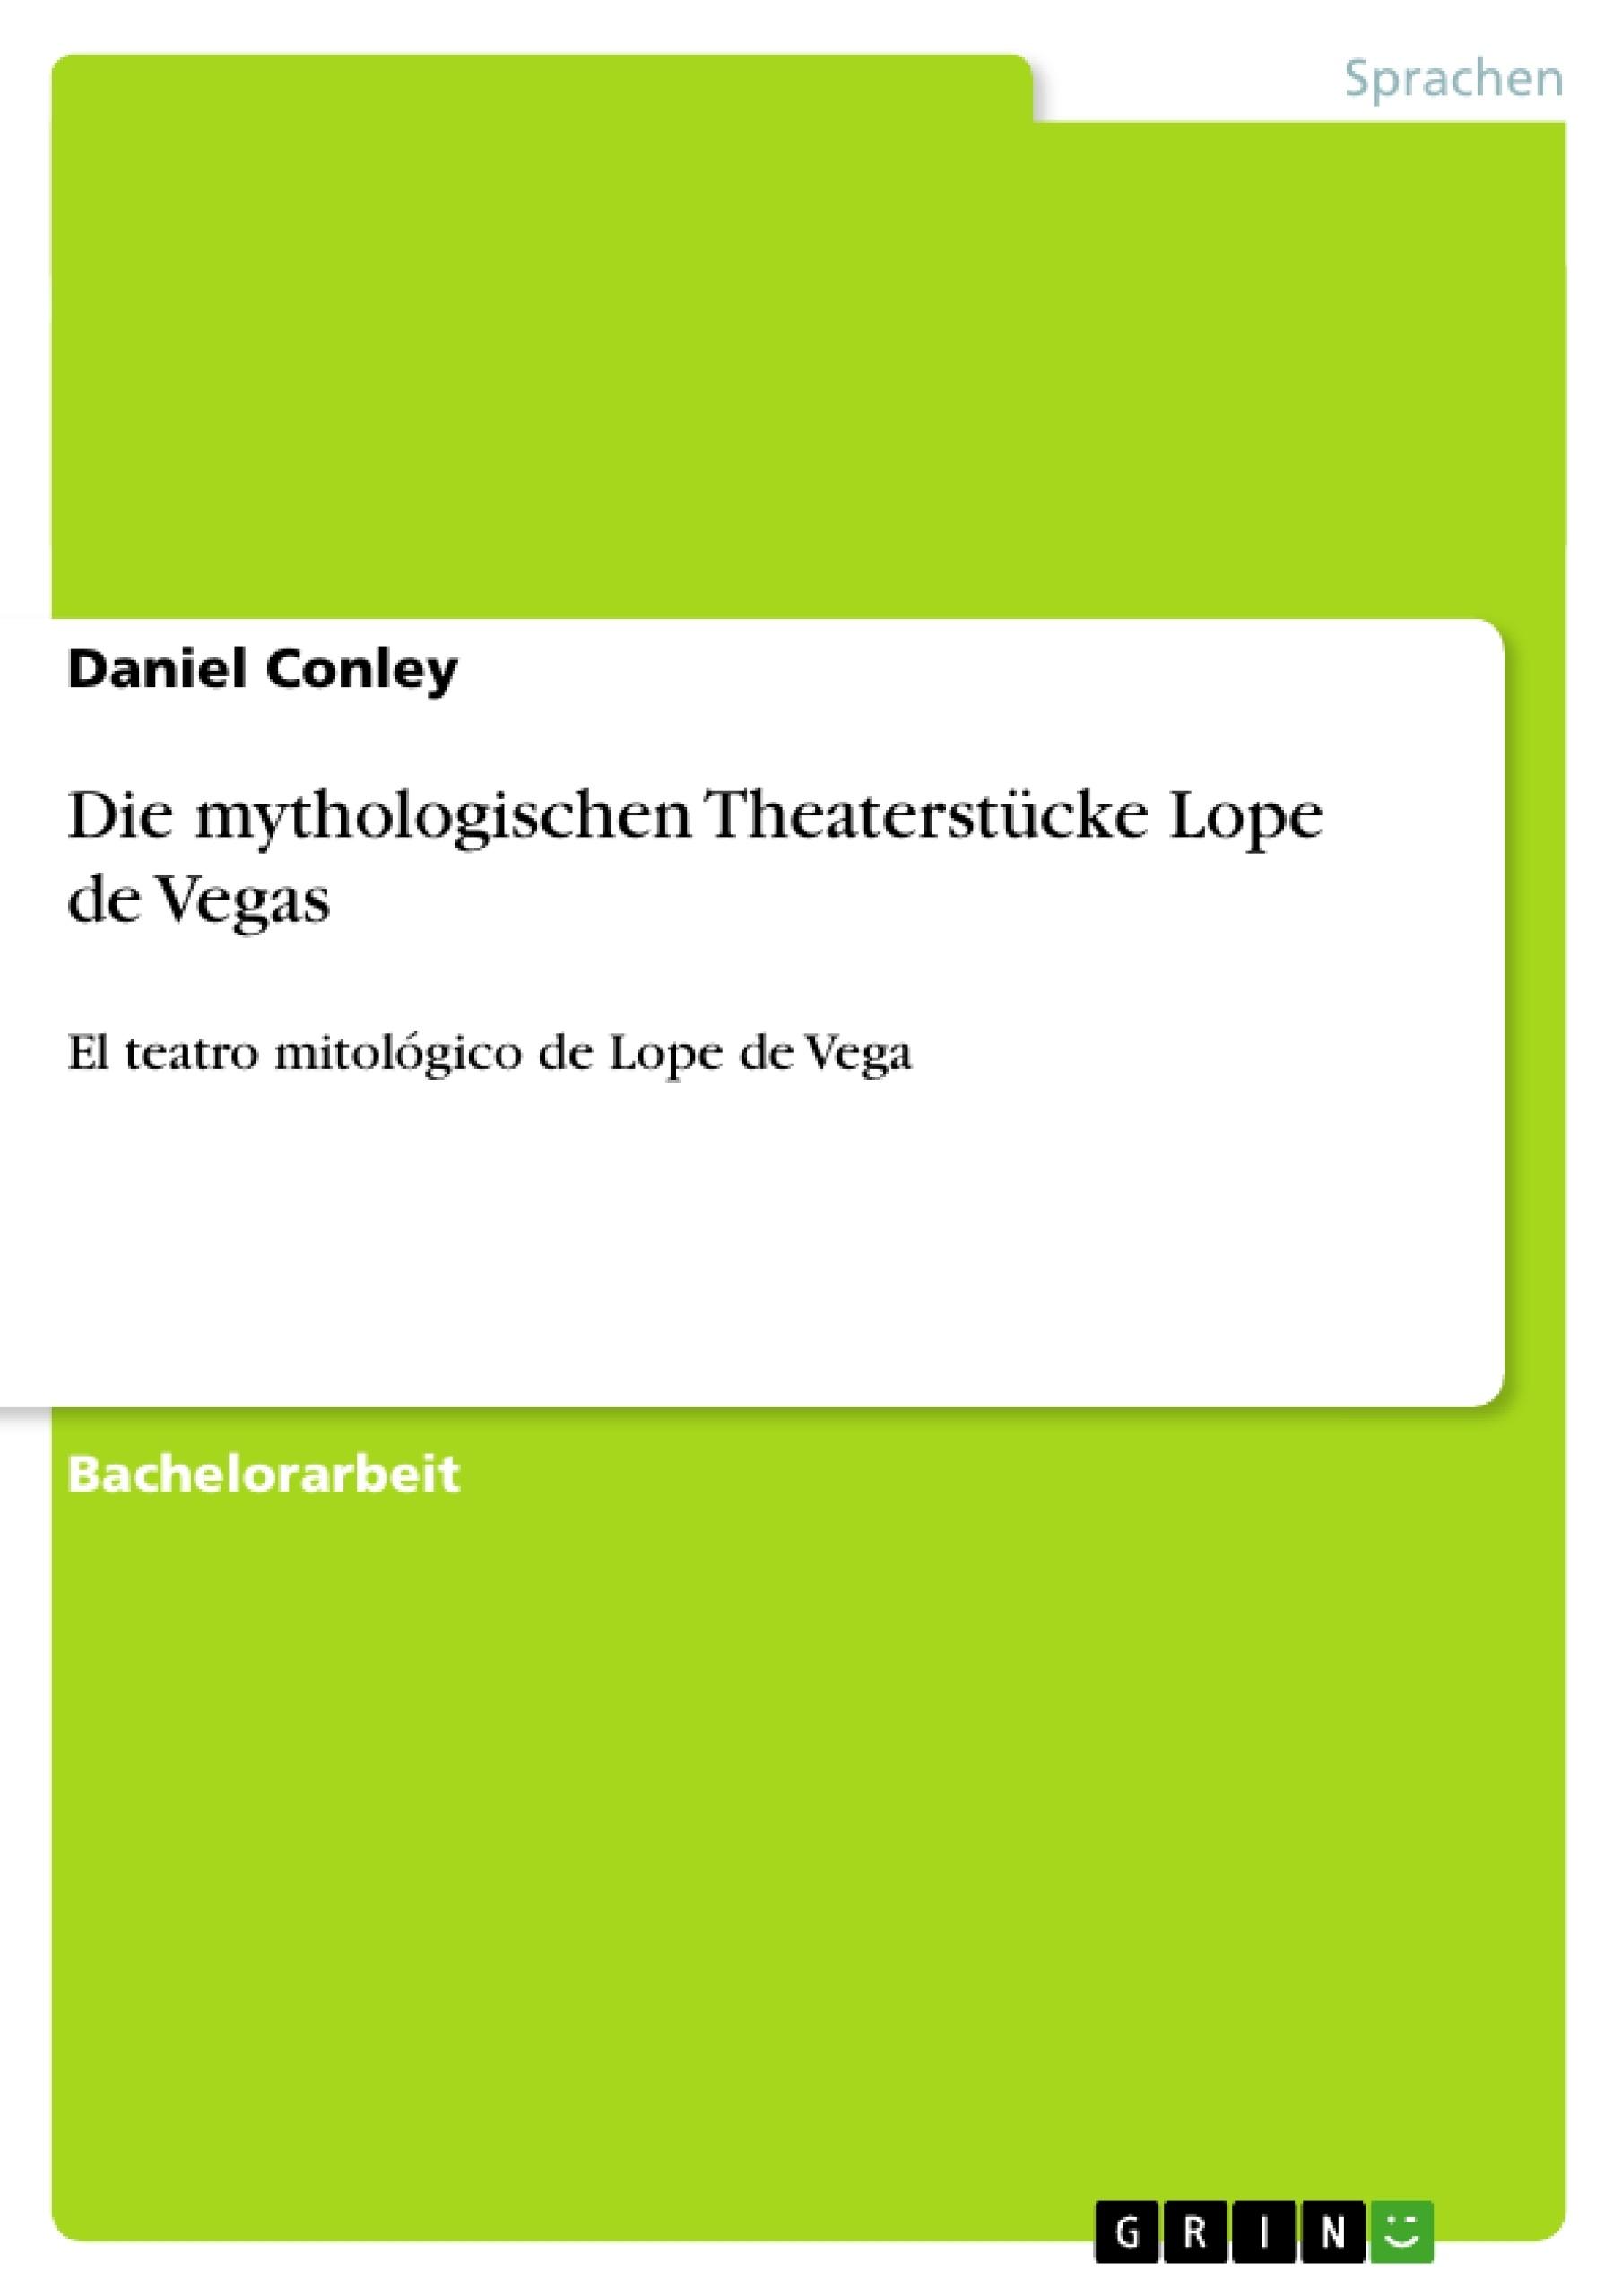 Titel: Die mythologischen Theaterstücke Lope de Vegas